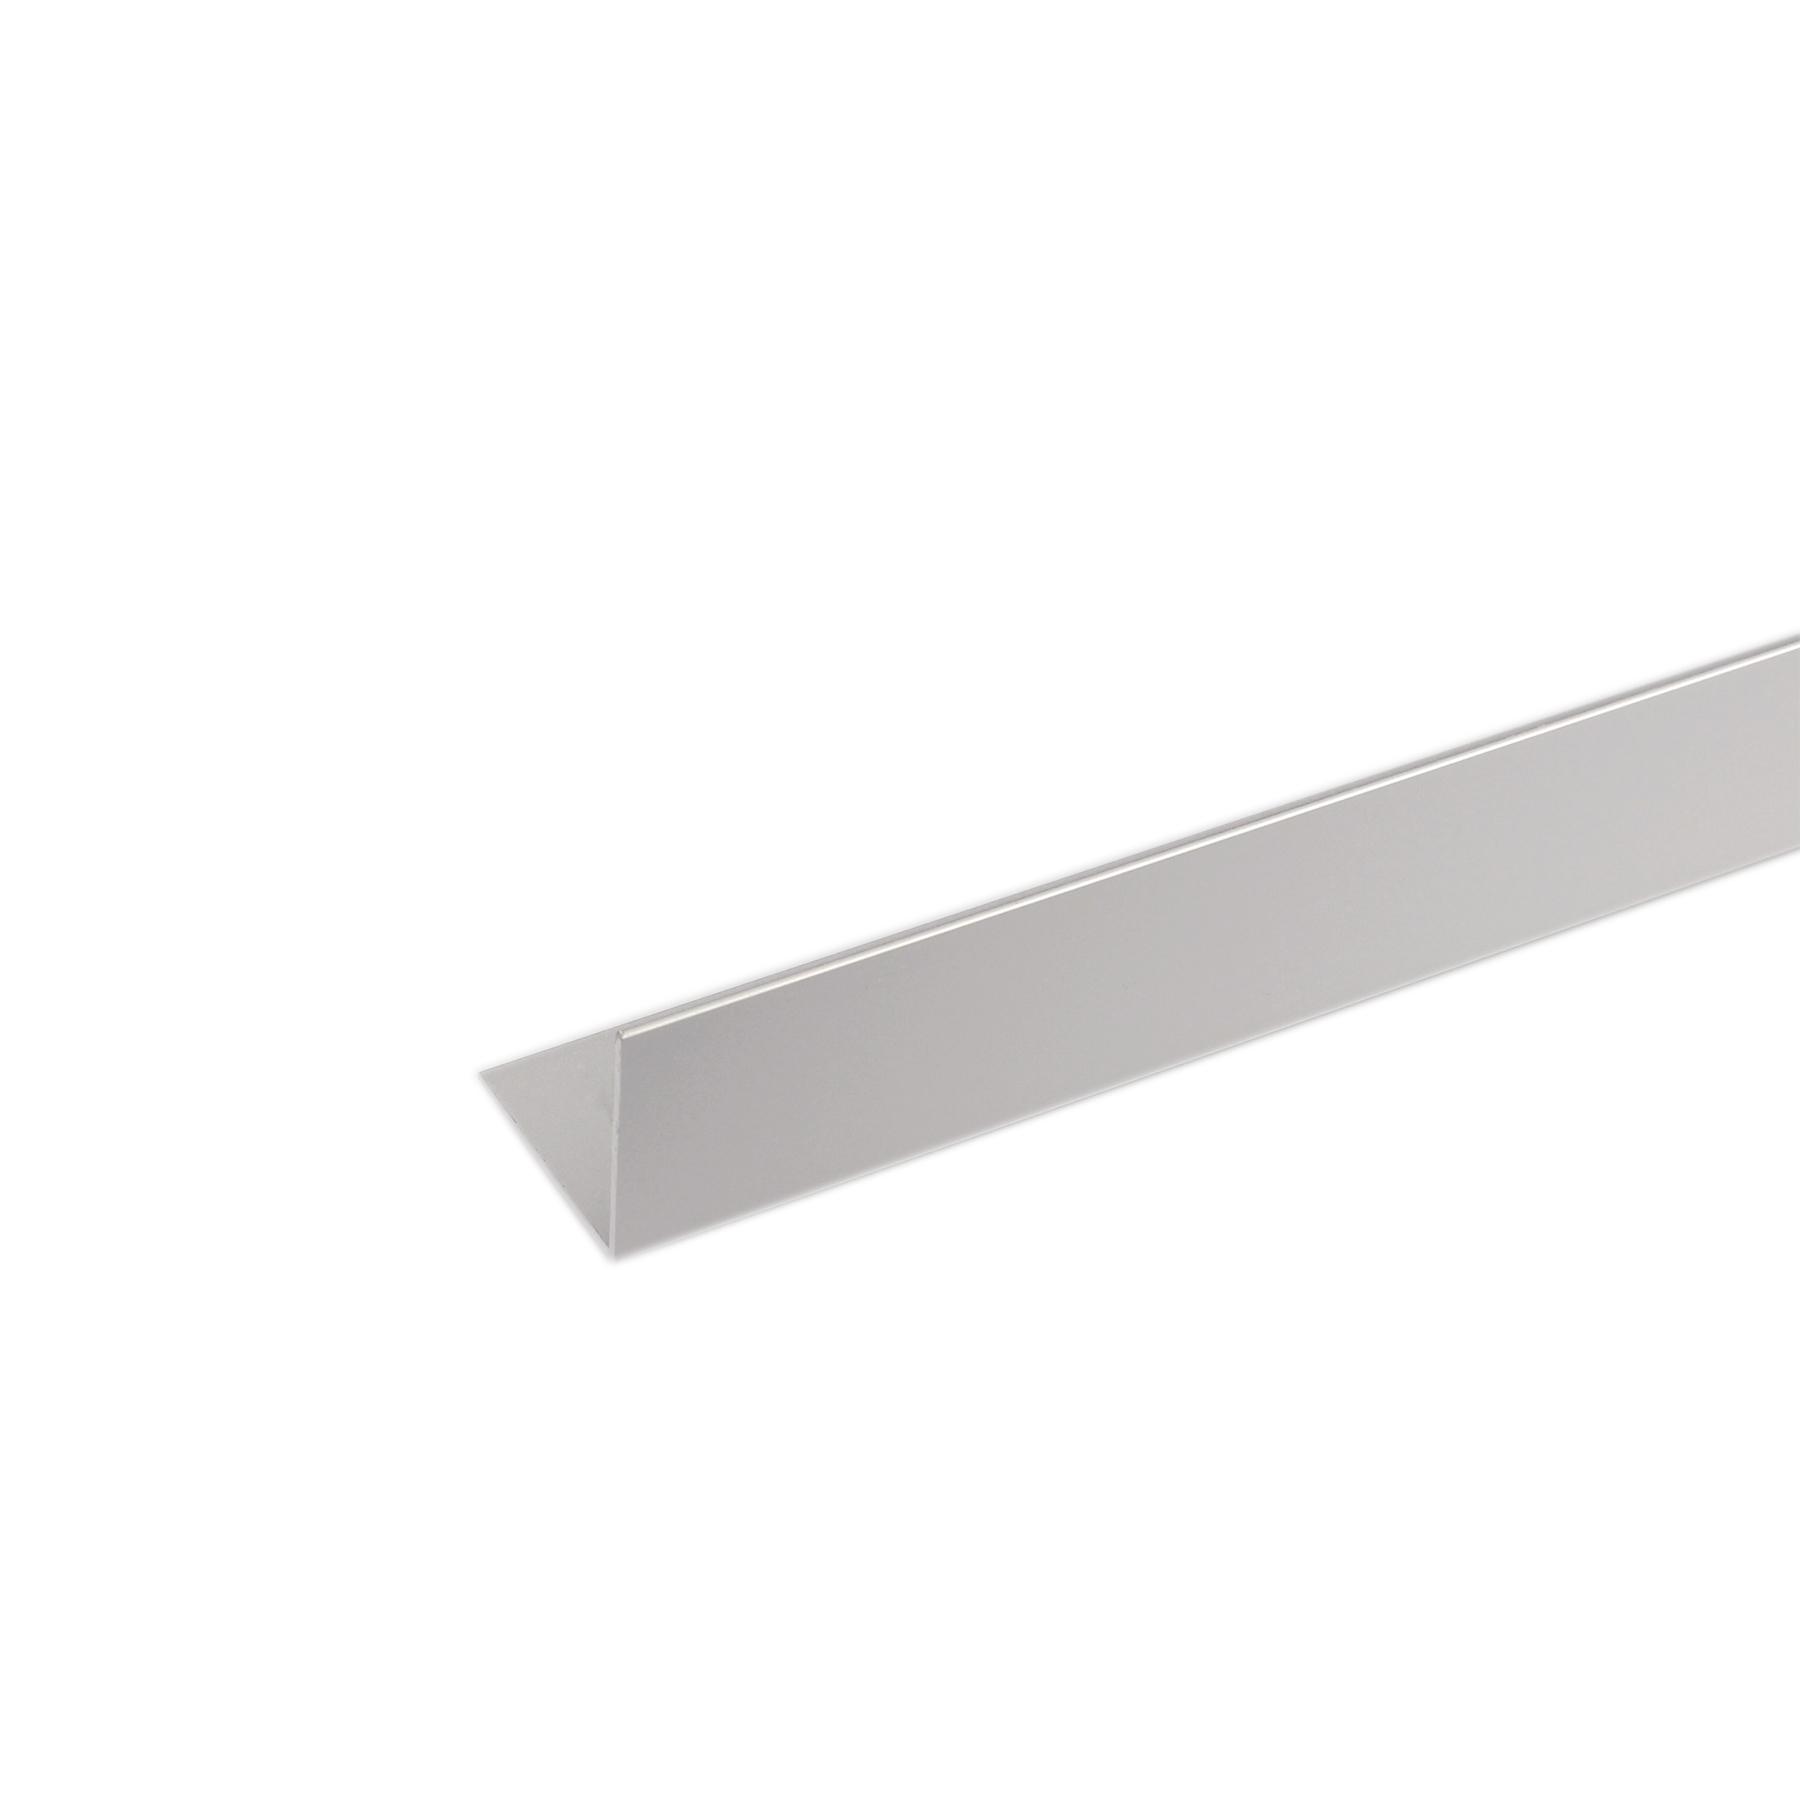 Perfil Canto Alumínio Anodizado 1mx2cm